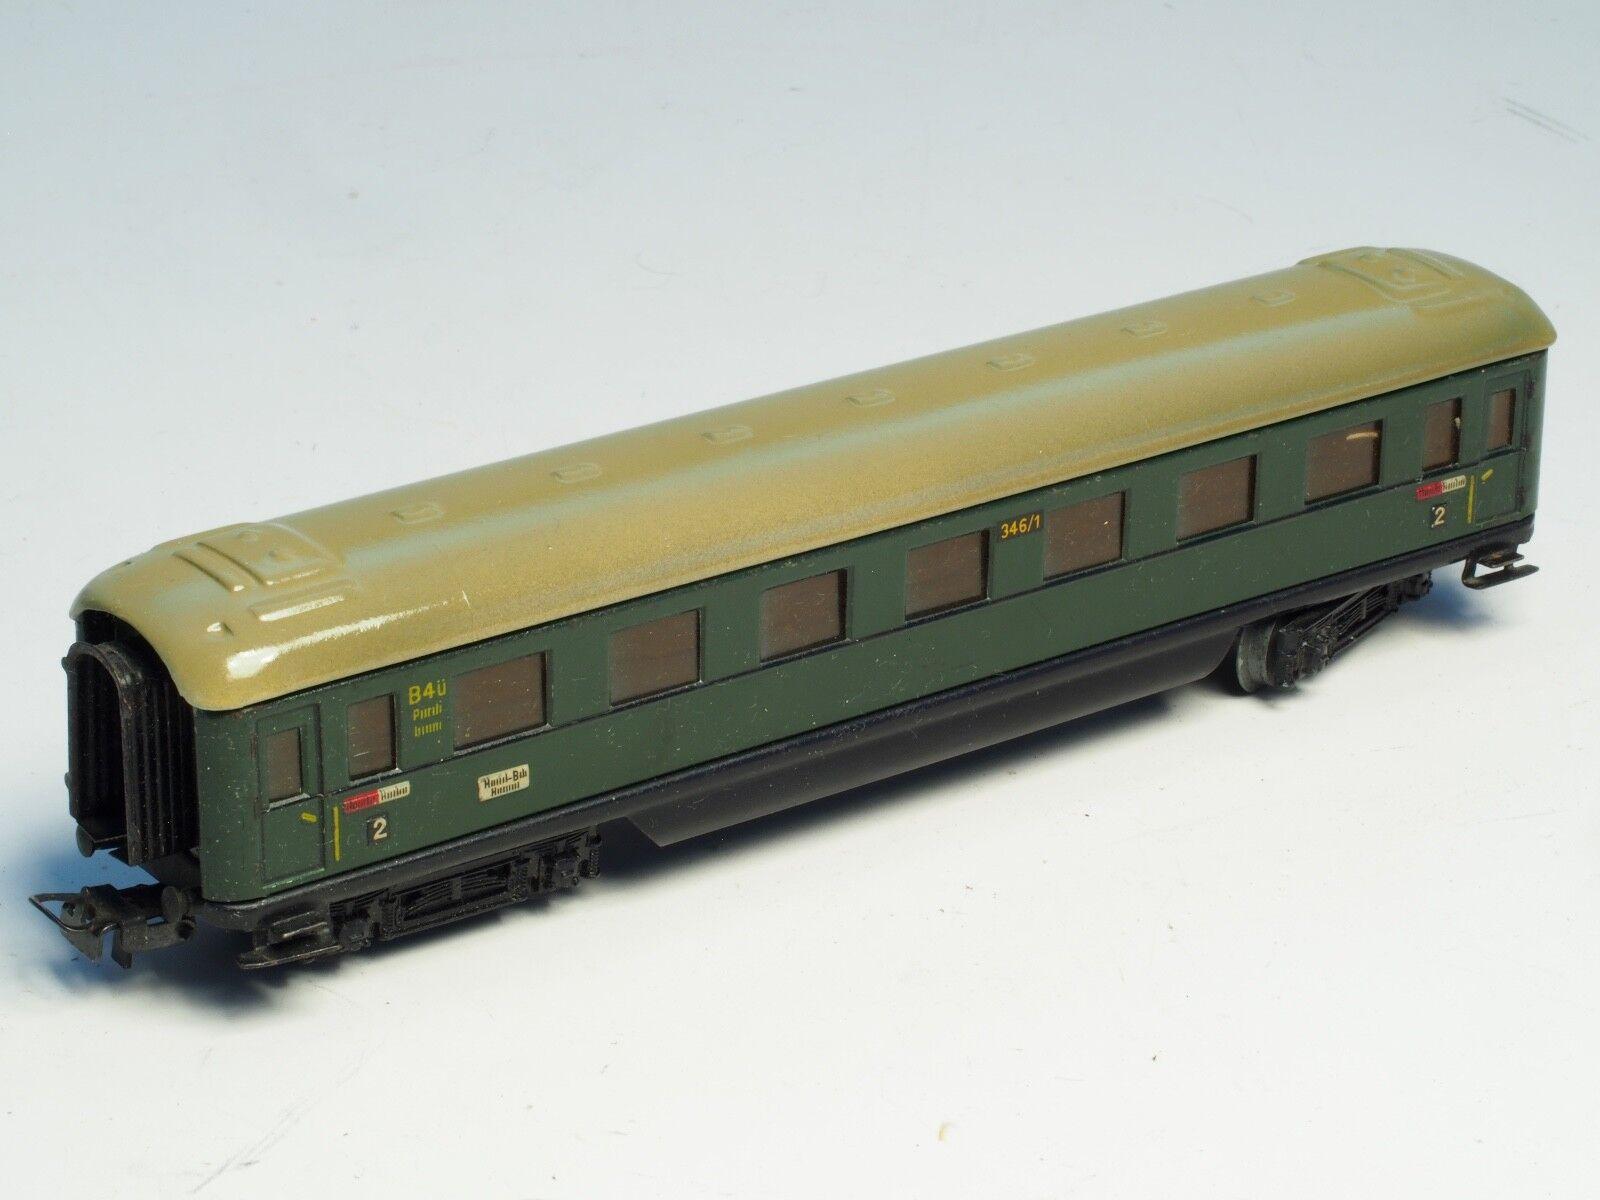 346/1  MARKLIN HO-gauge Metal German b4ü passenger car from 1950's